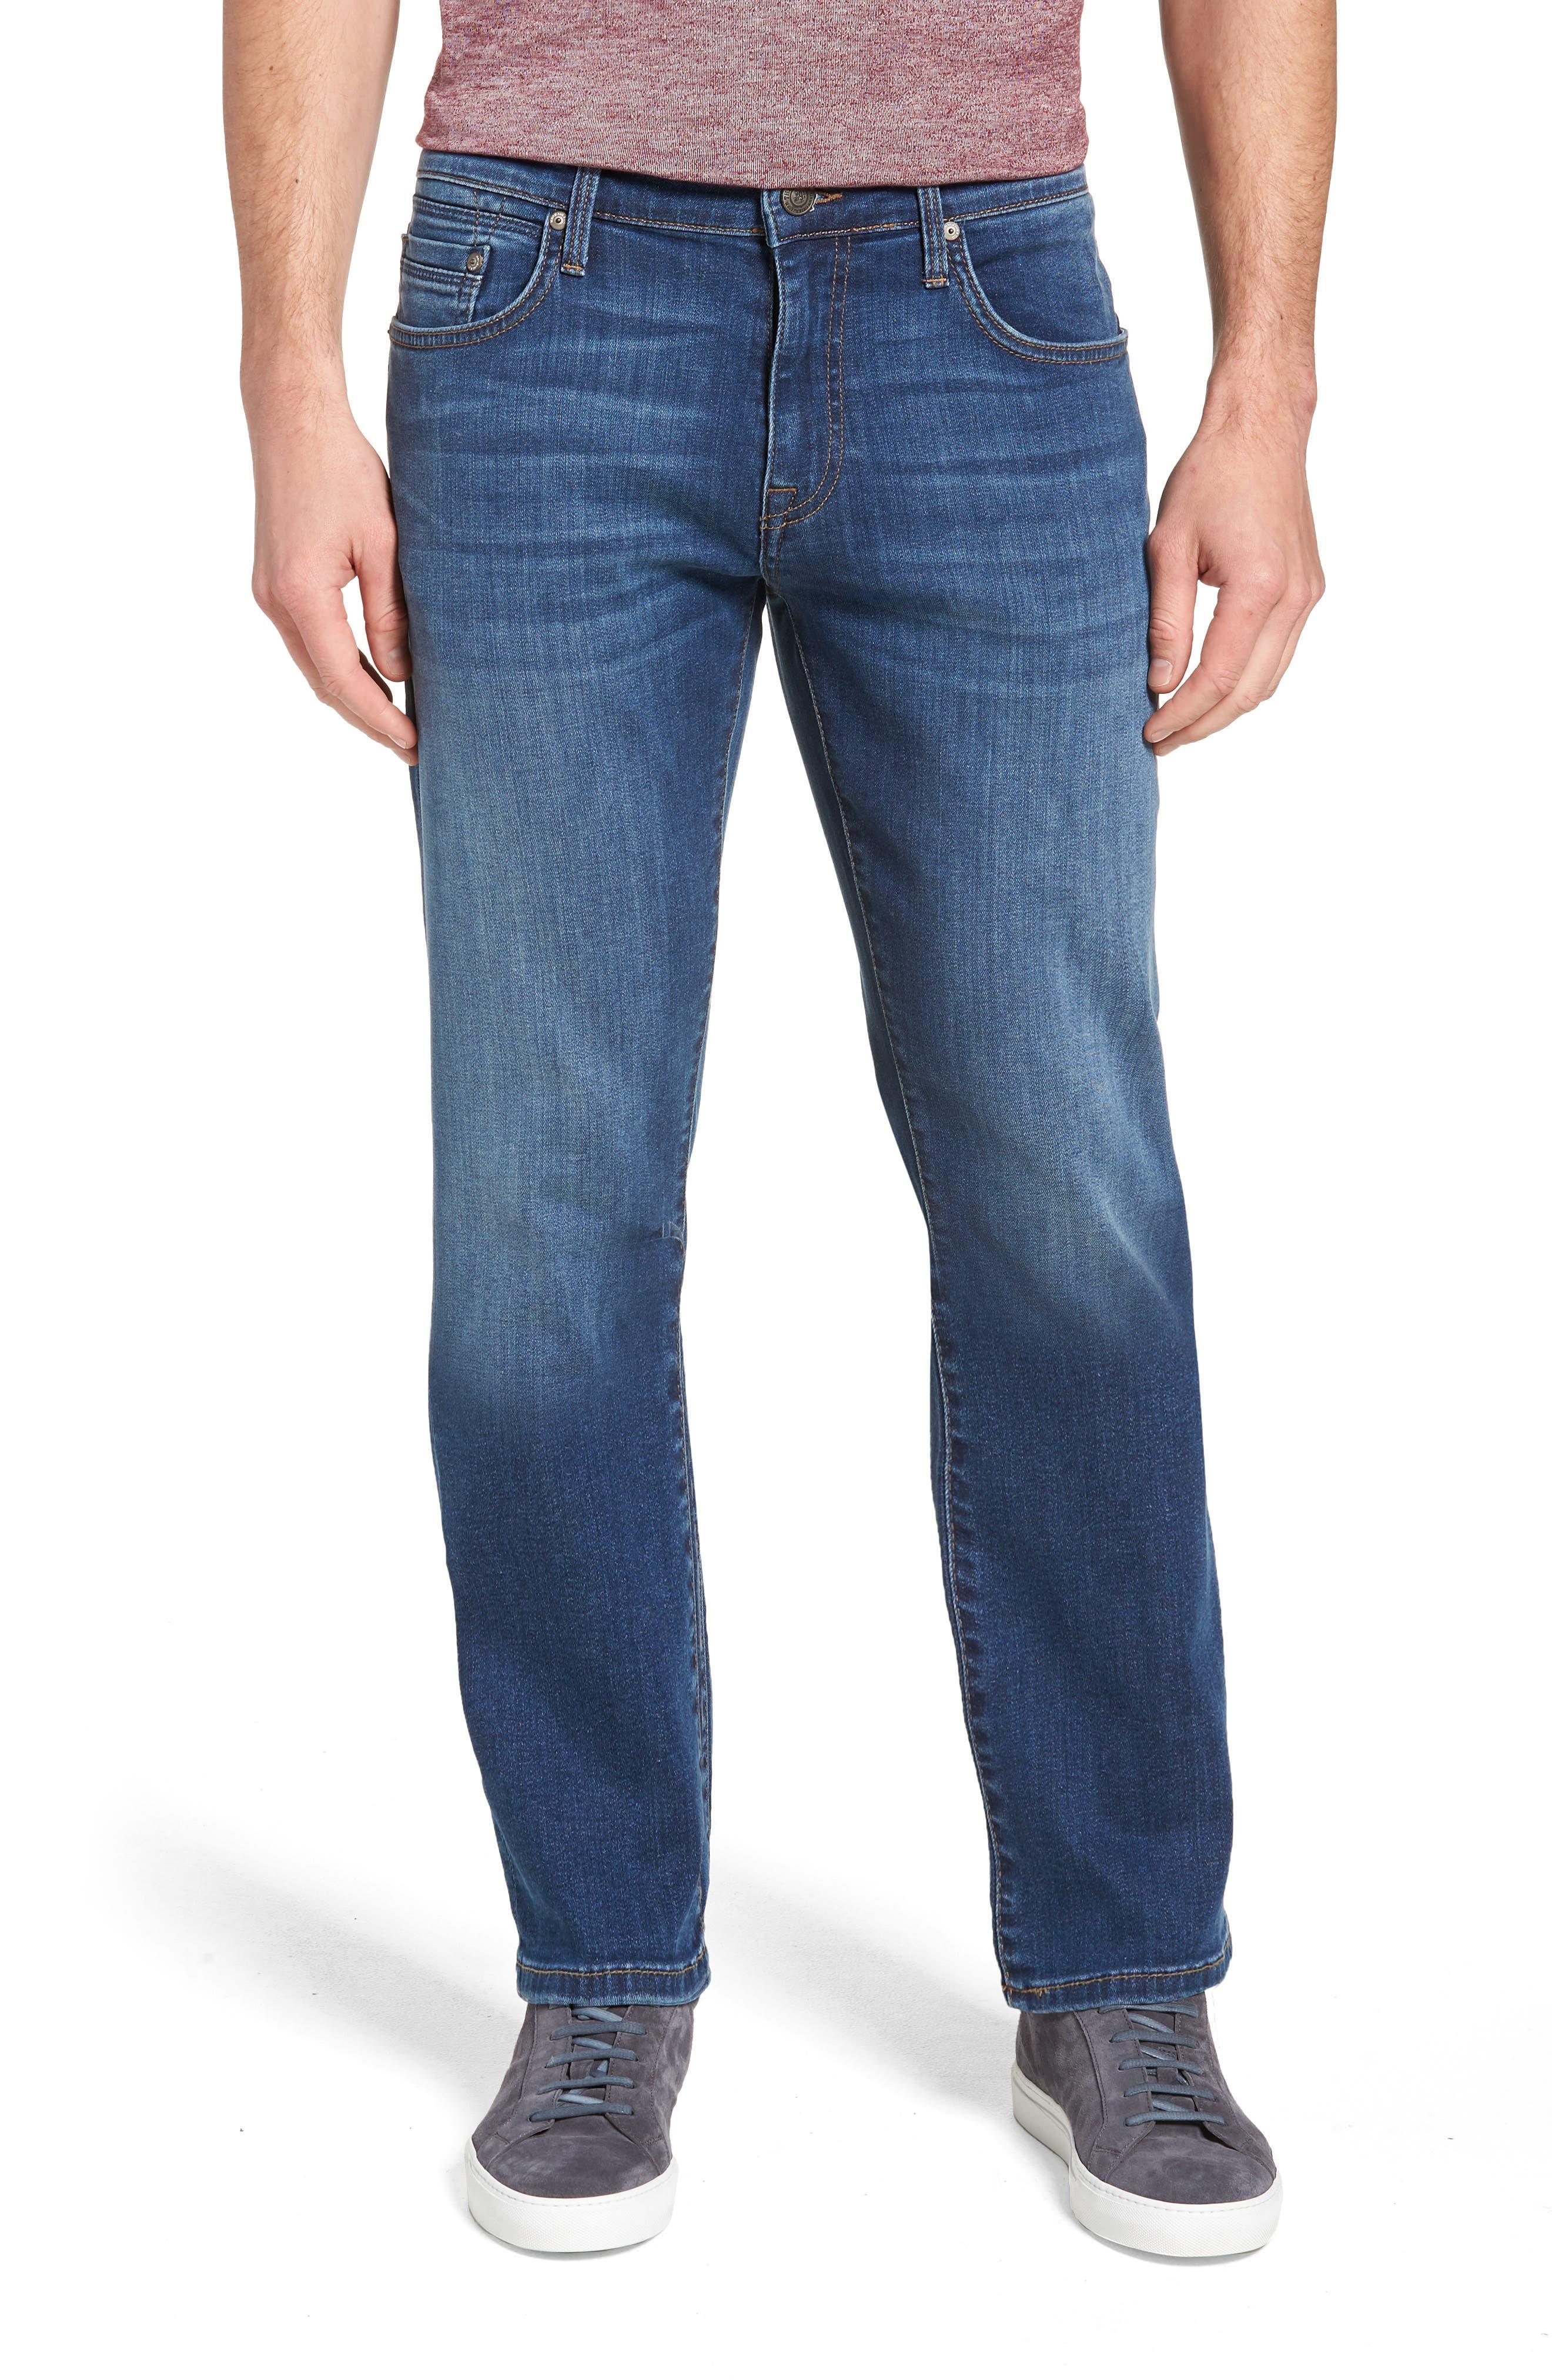 "Image of Mavi Zach Straight Leg Jeans - 30-34"" Inseam"